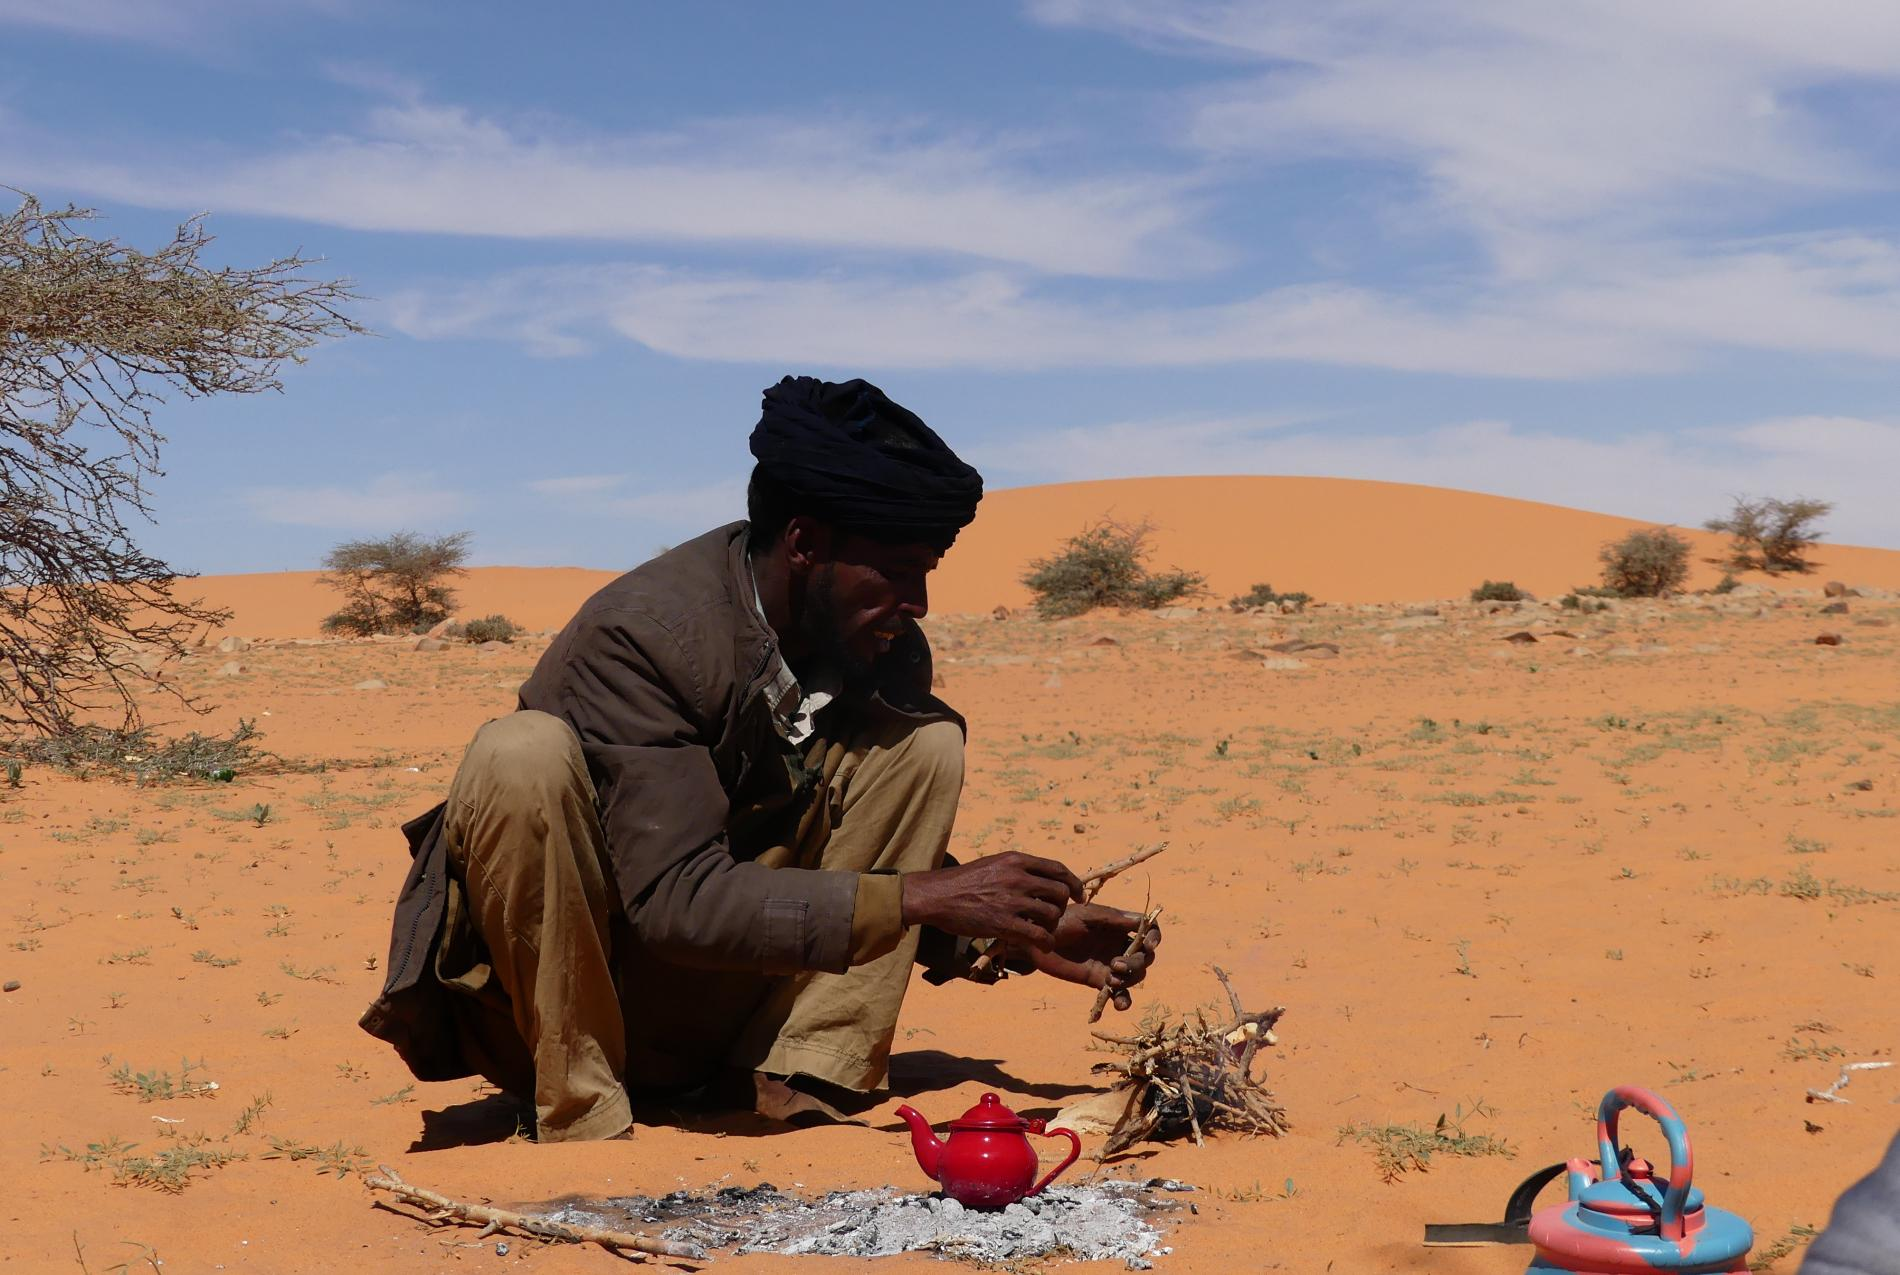 Voyage solidaire Mauritanie : Vision du Monde - Photo 3